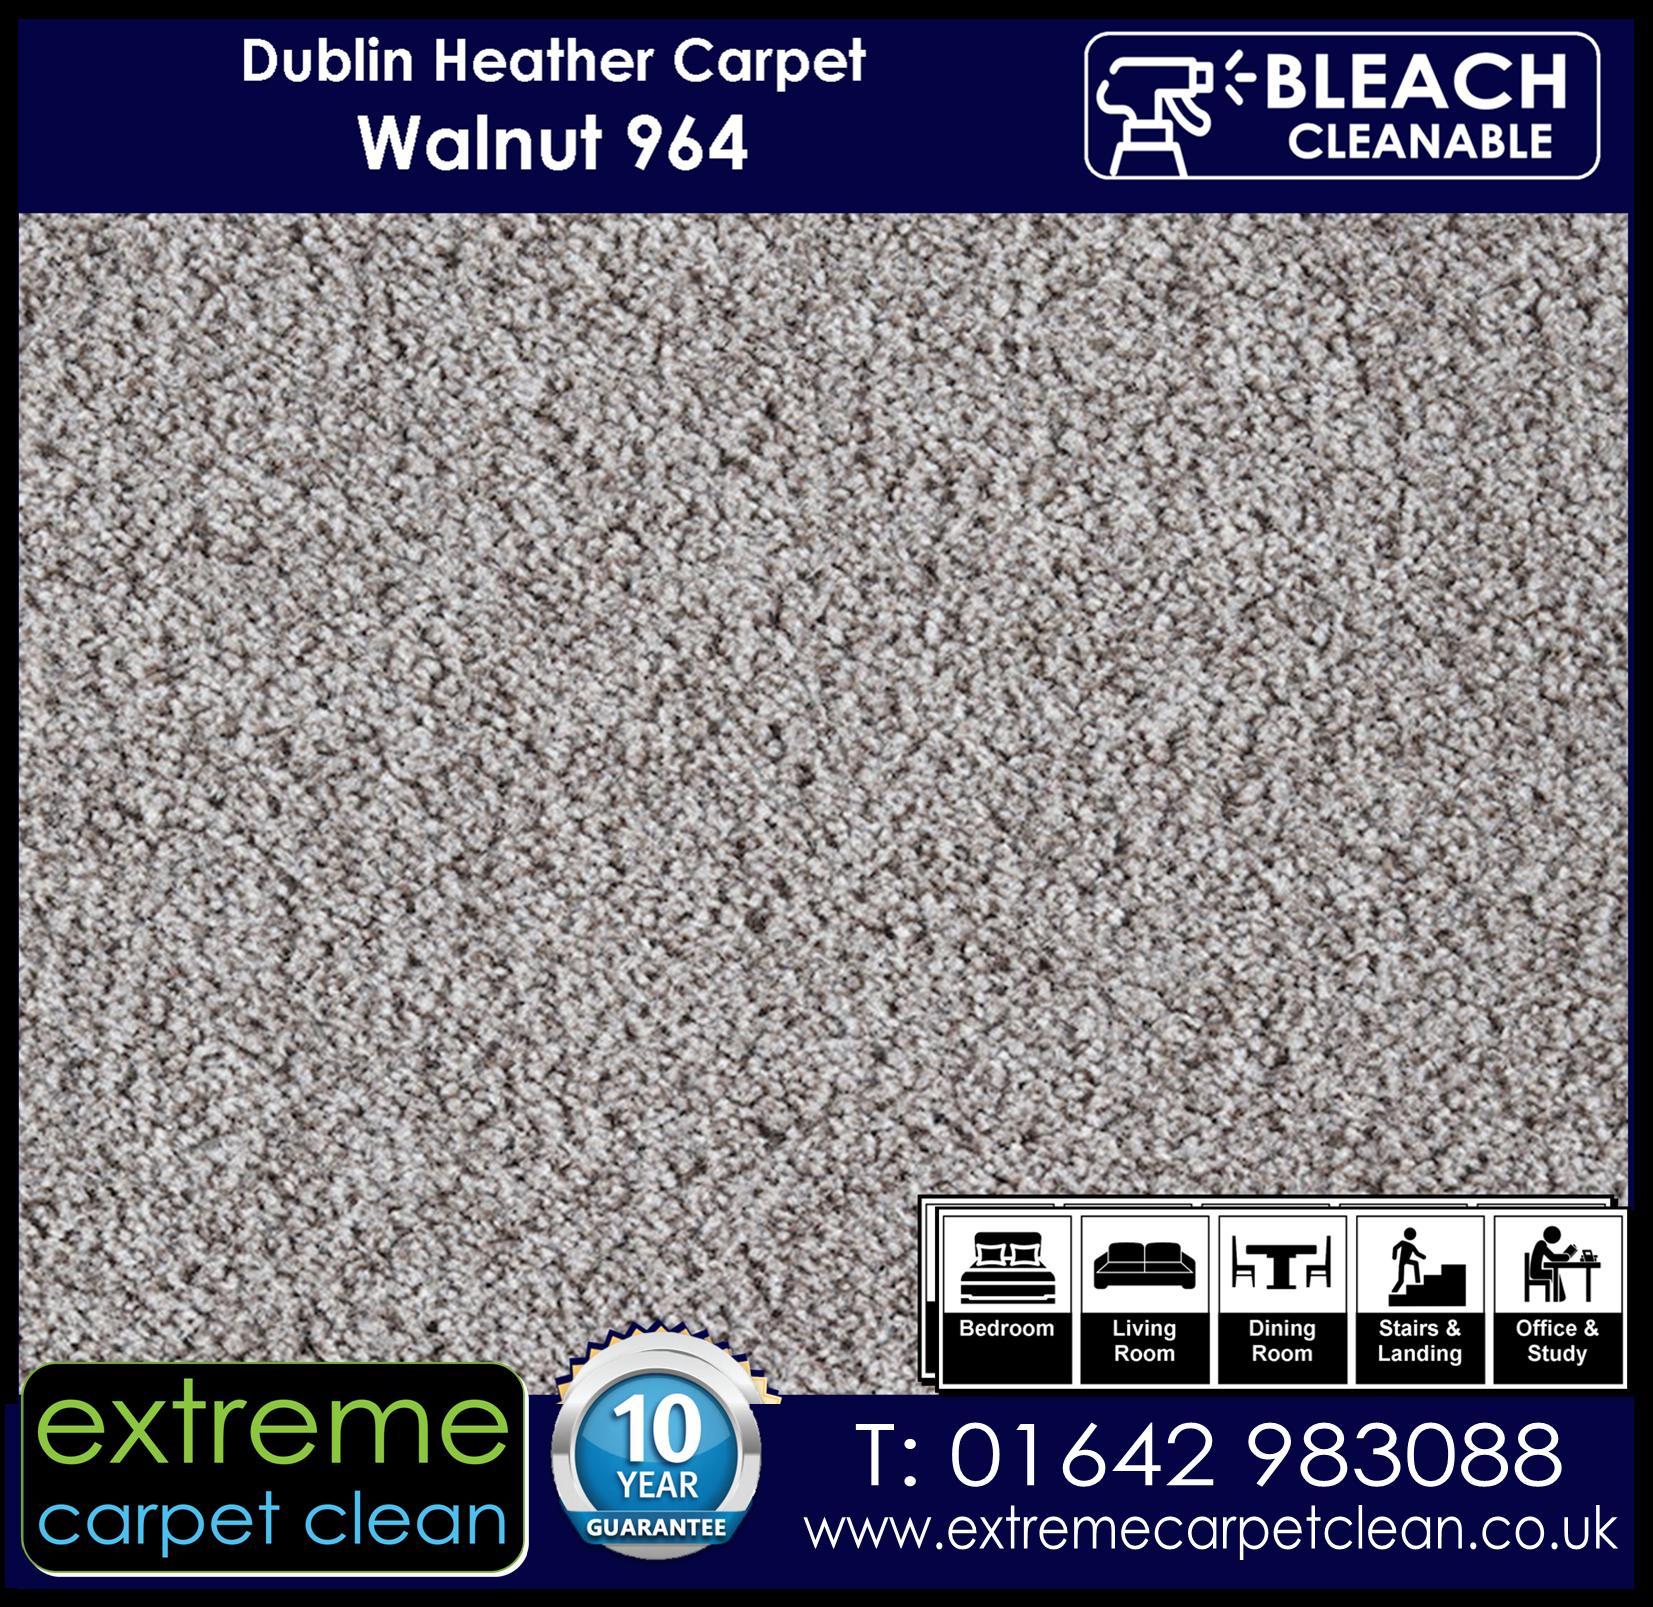 Dublin Heather Carpet Range. Walnut 964 Extreme Carpet Clean